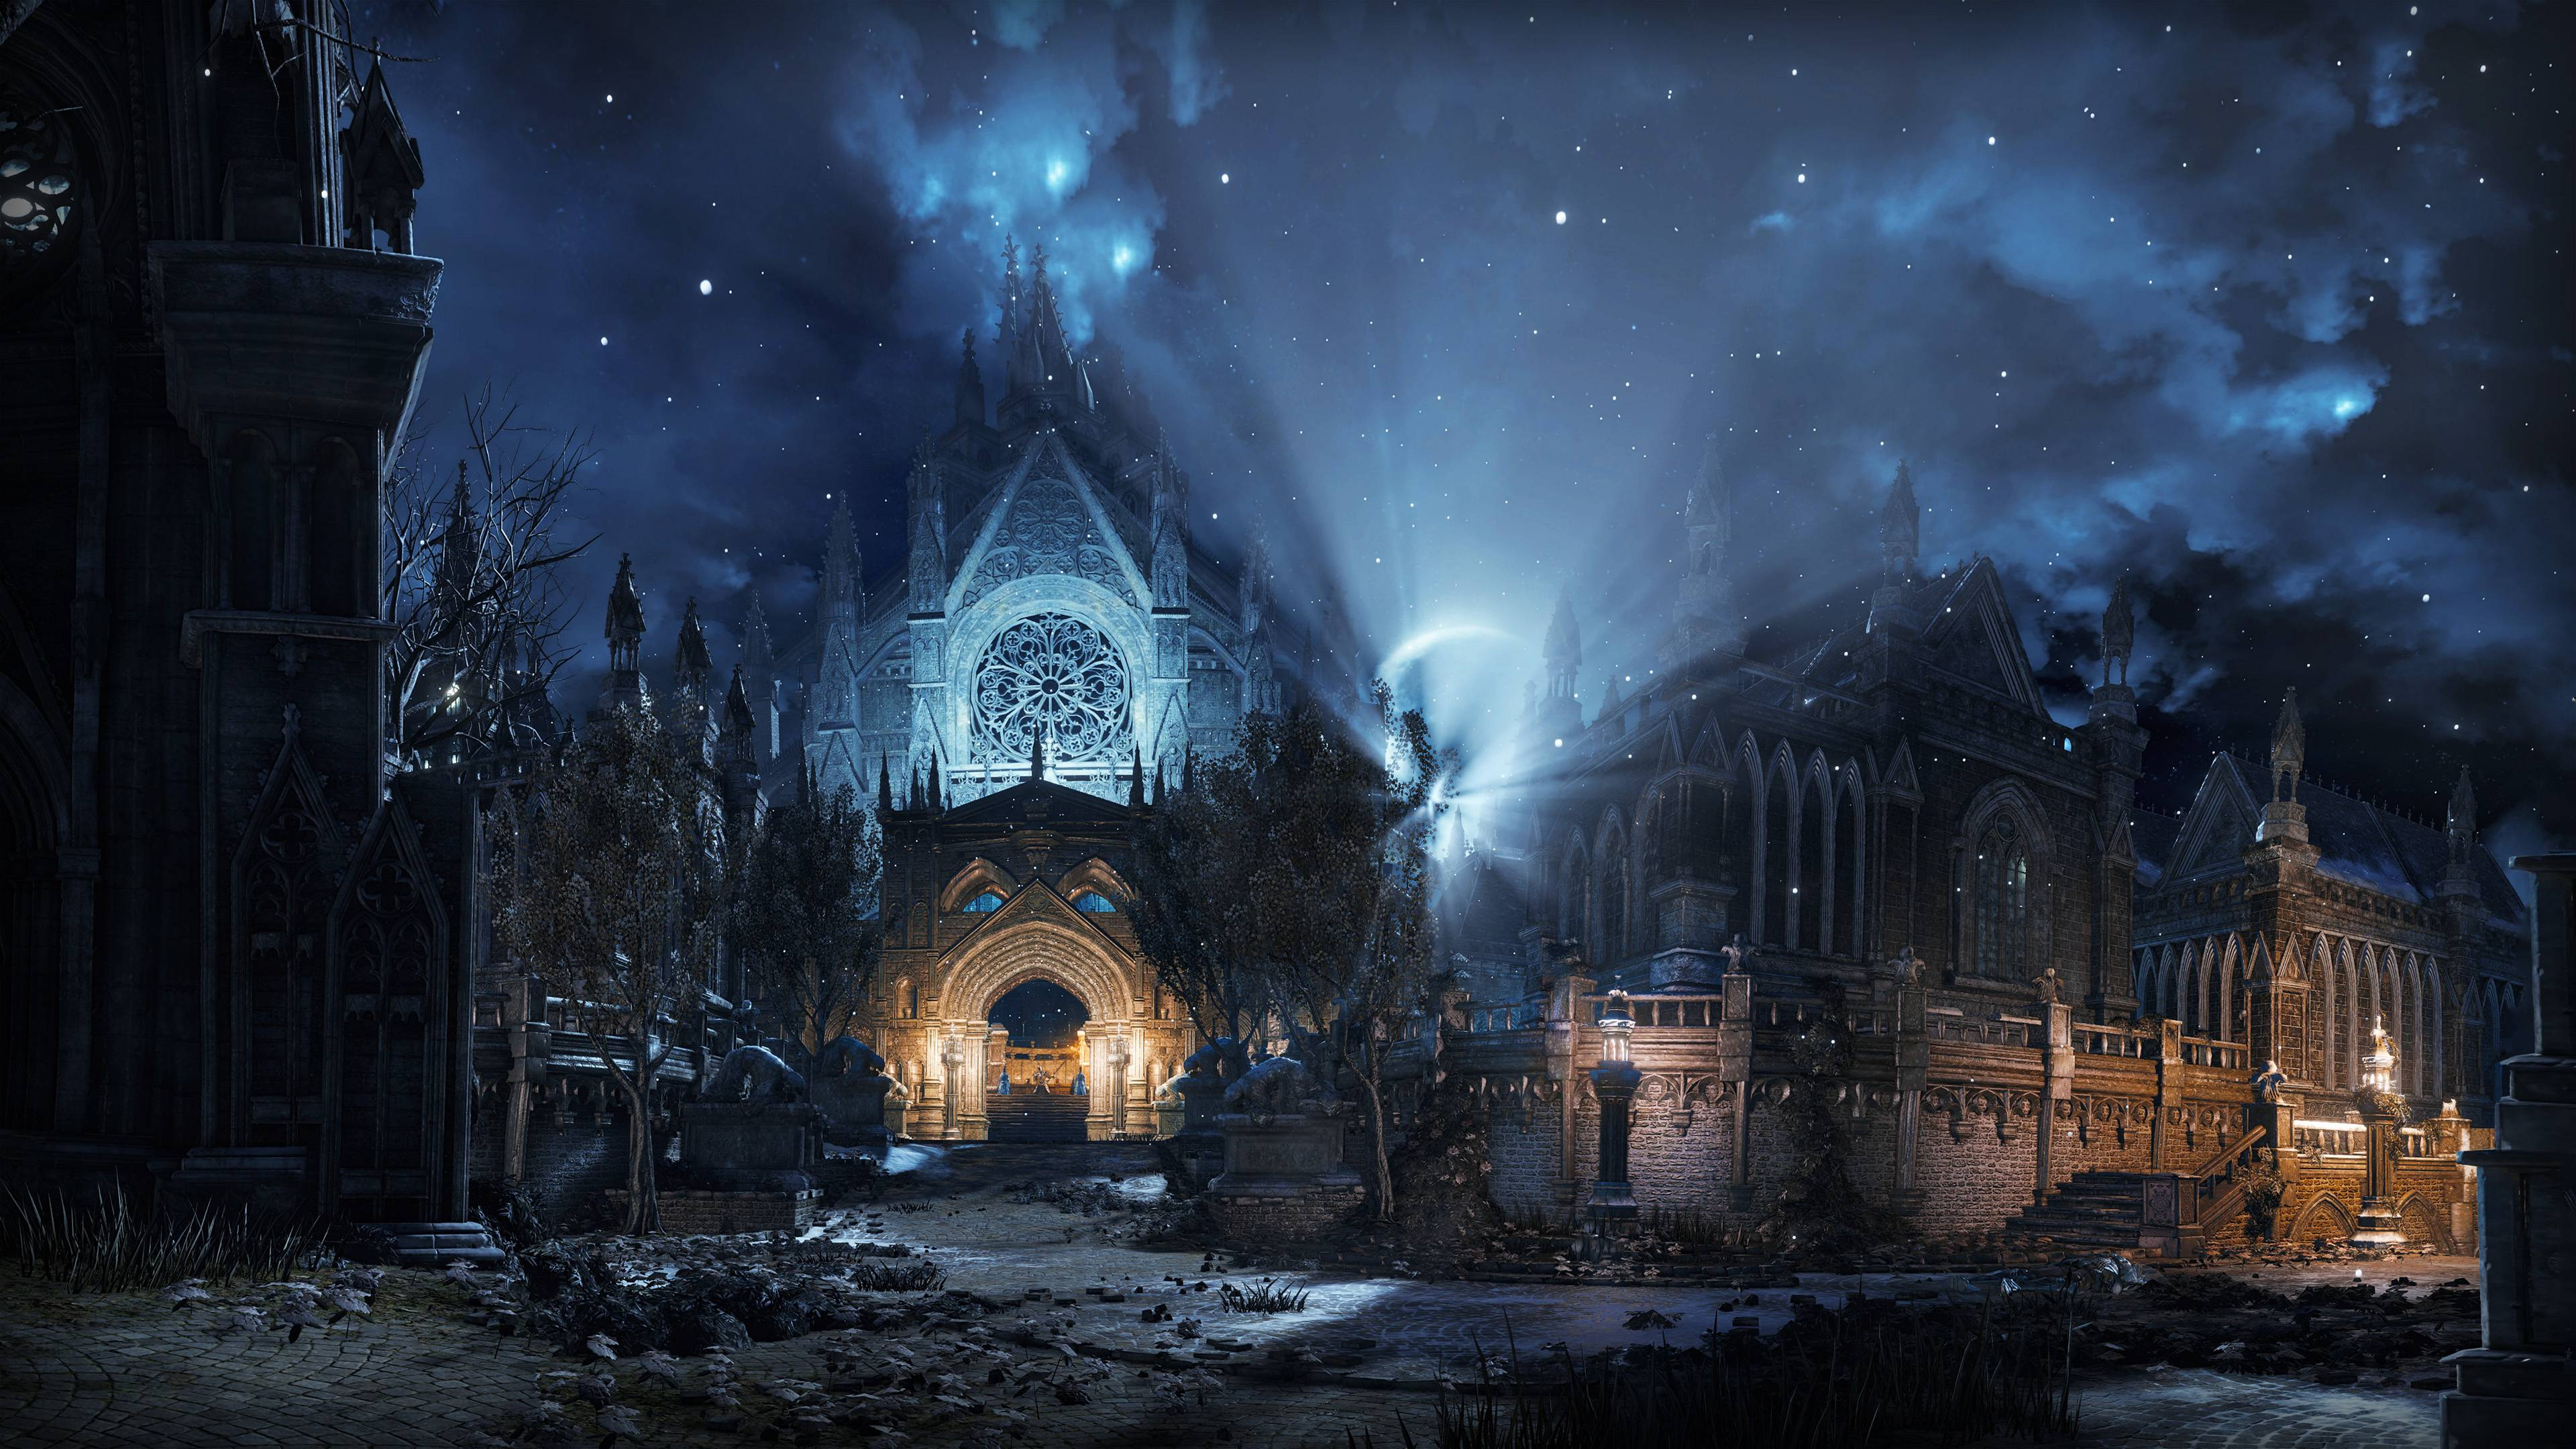 Dark Souls 3 4k Wallpaper: Dark Souls III 4k Ultra HD Wallpaper